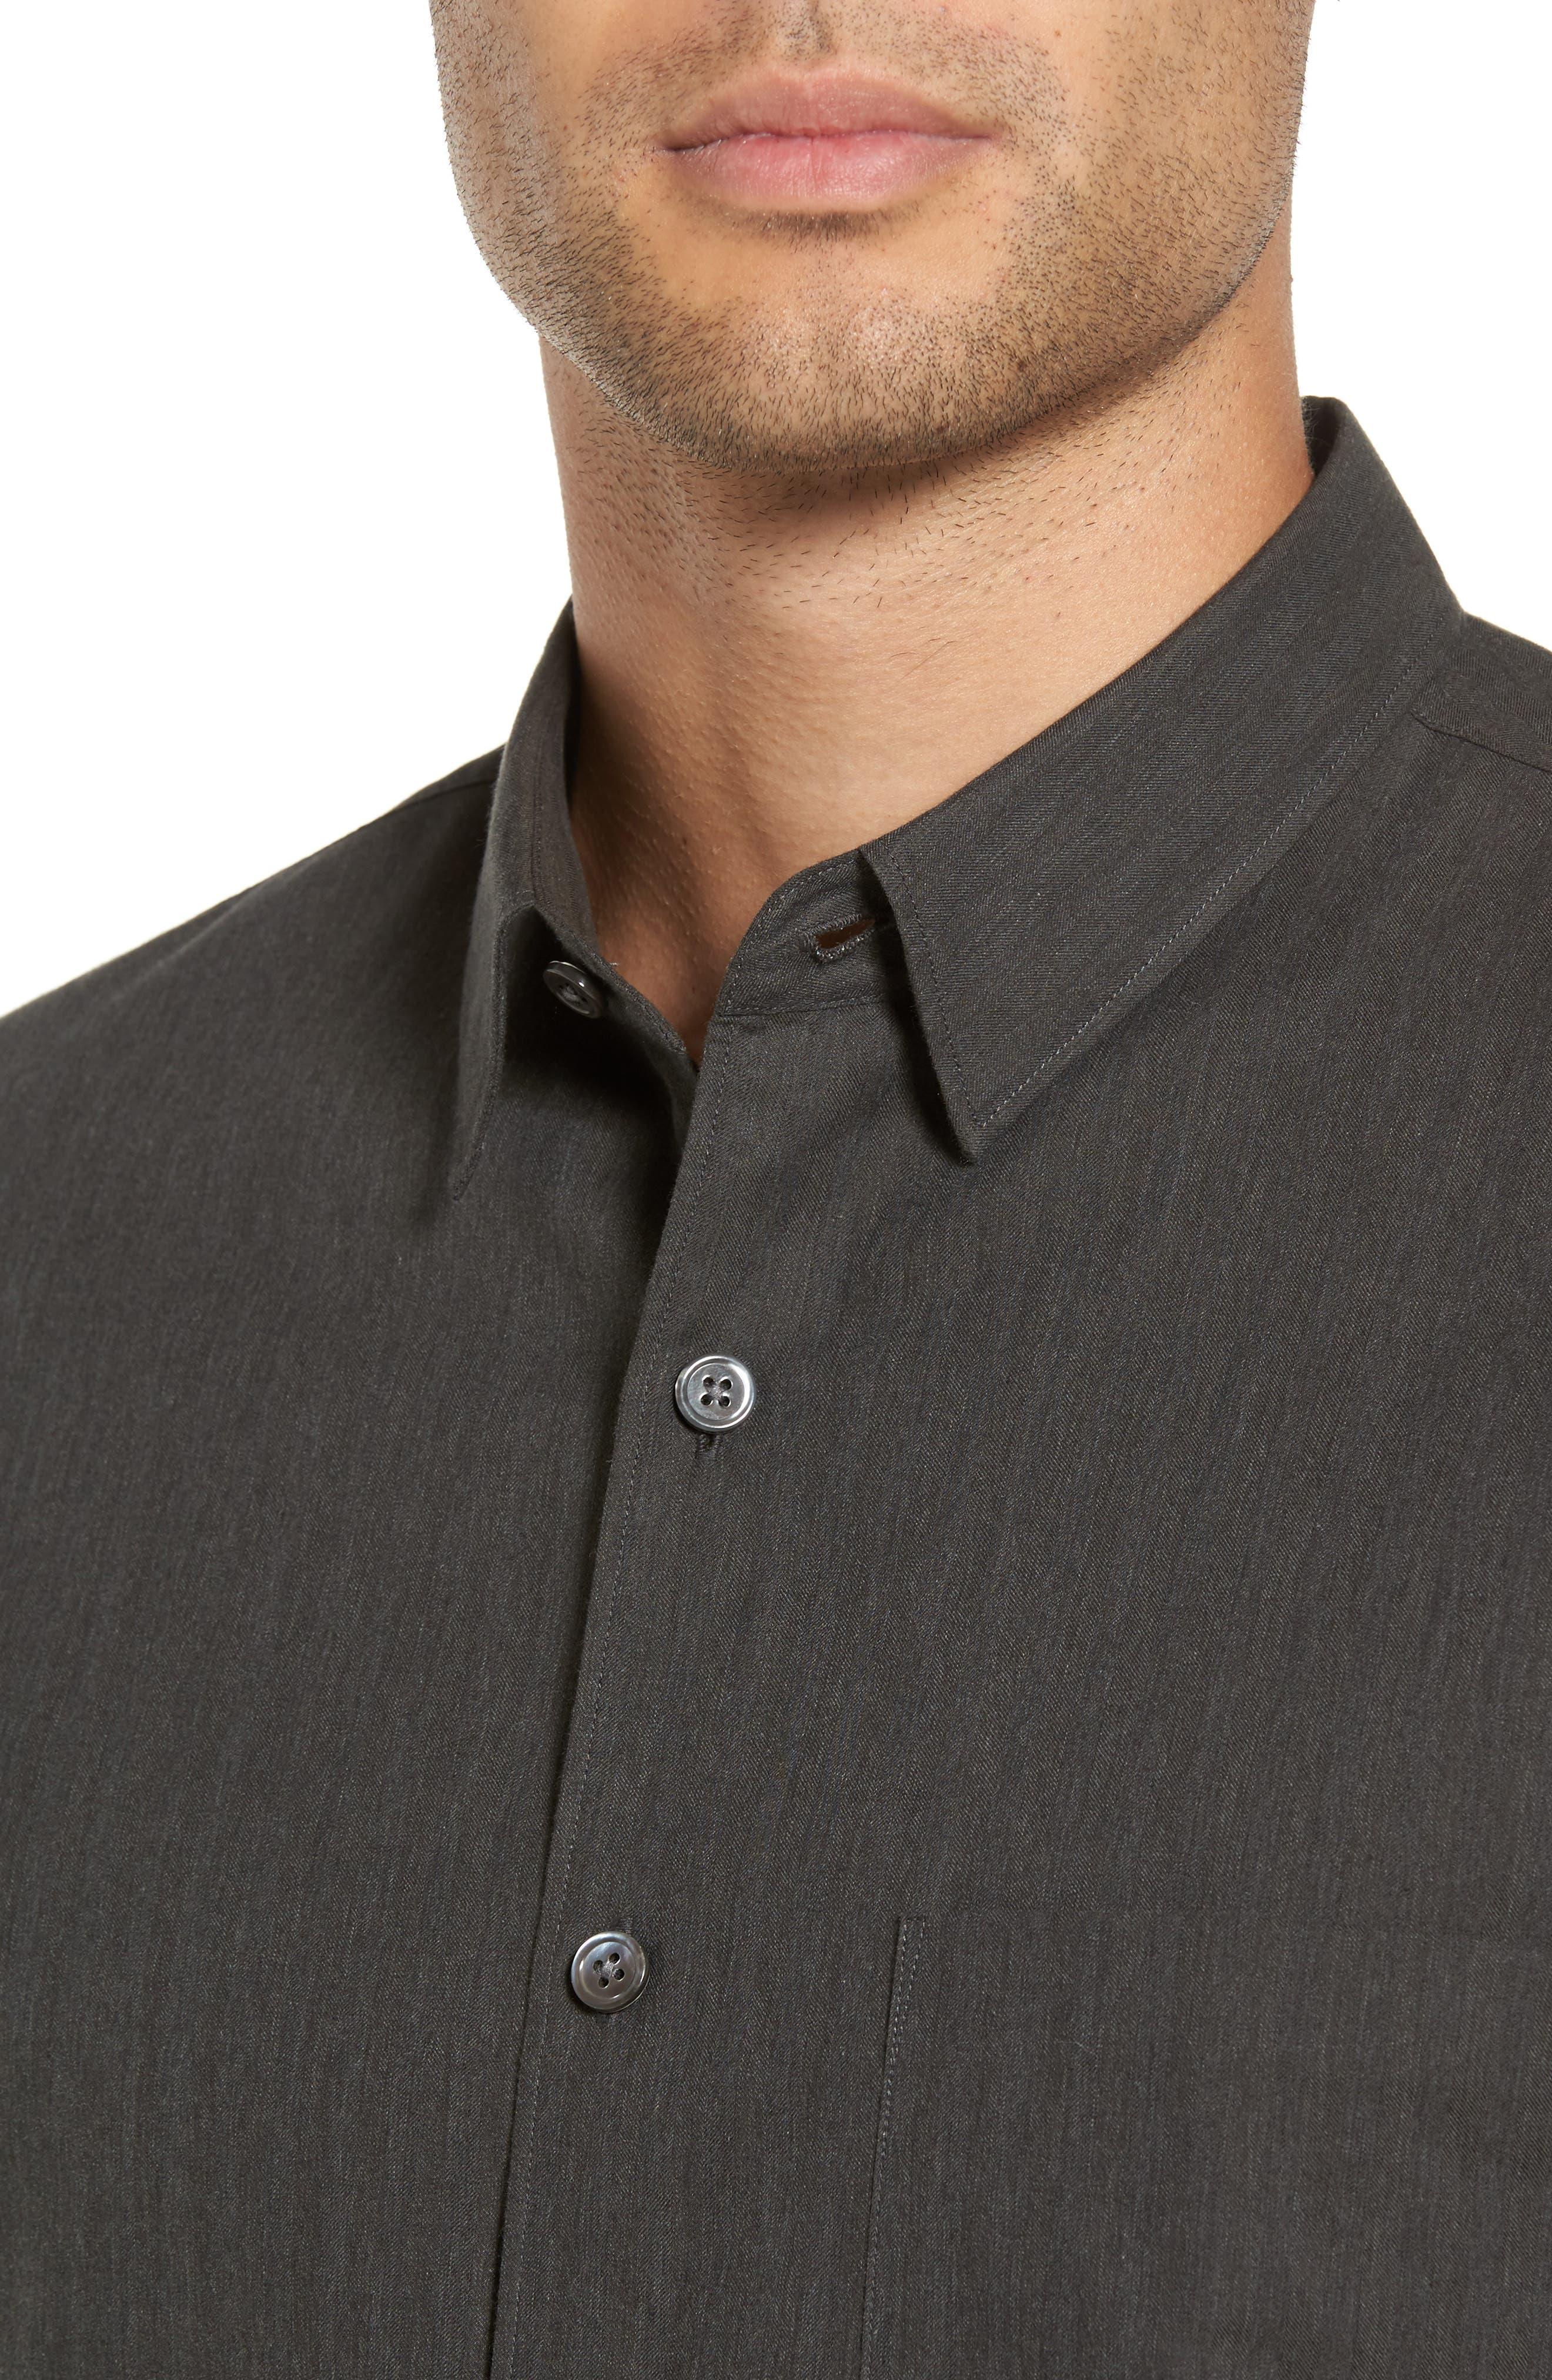 Rammy Trim Fit Solid Sport Shirt,                             Alternate thumbnail 4, color,                             381